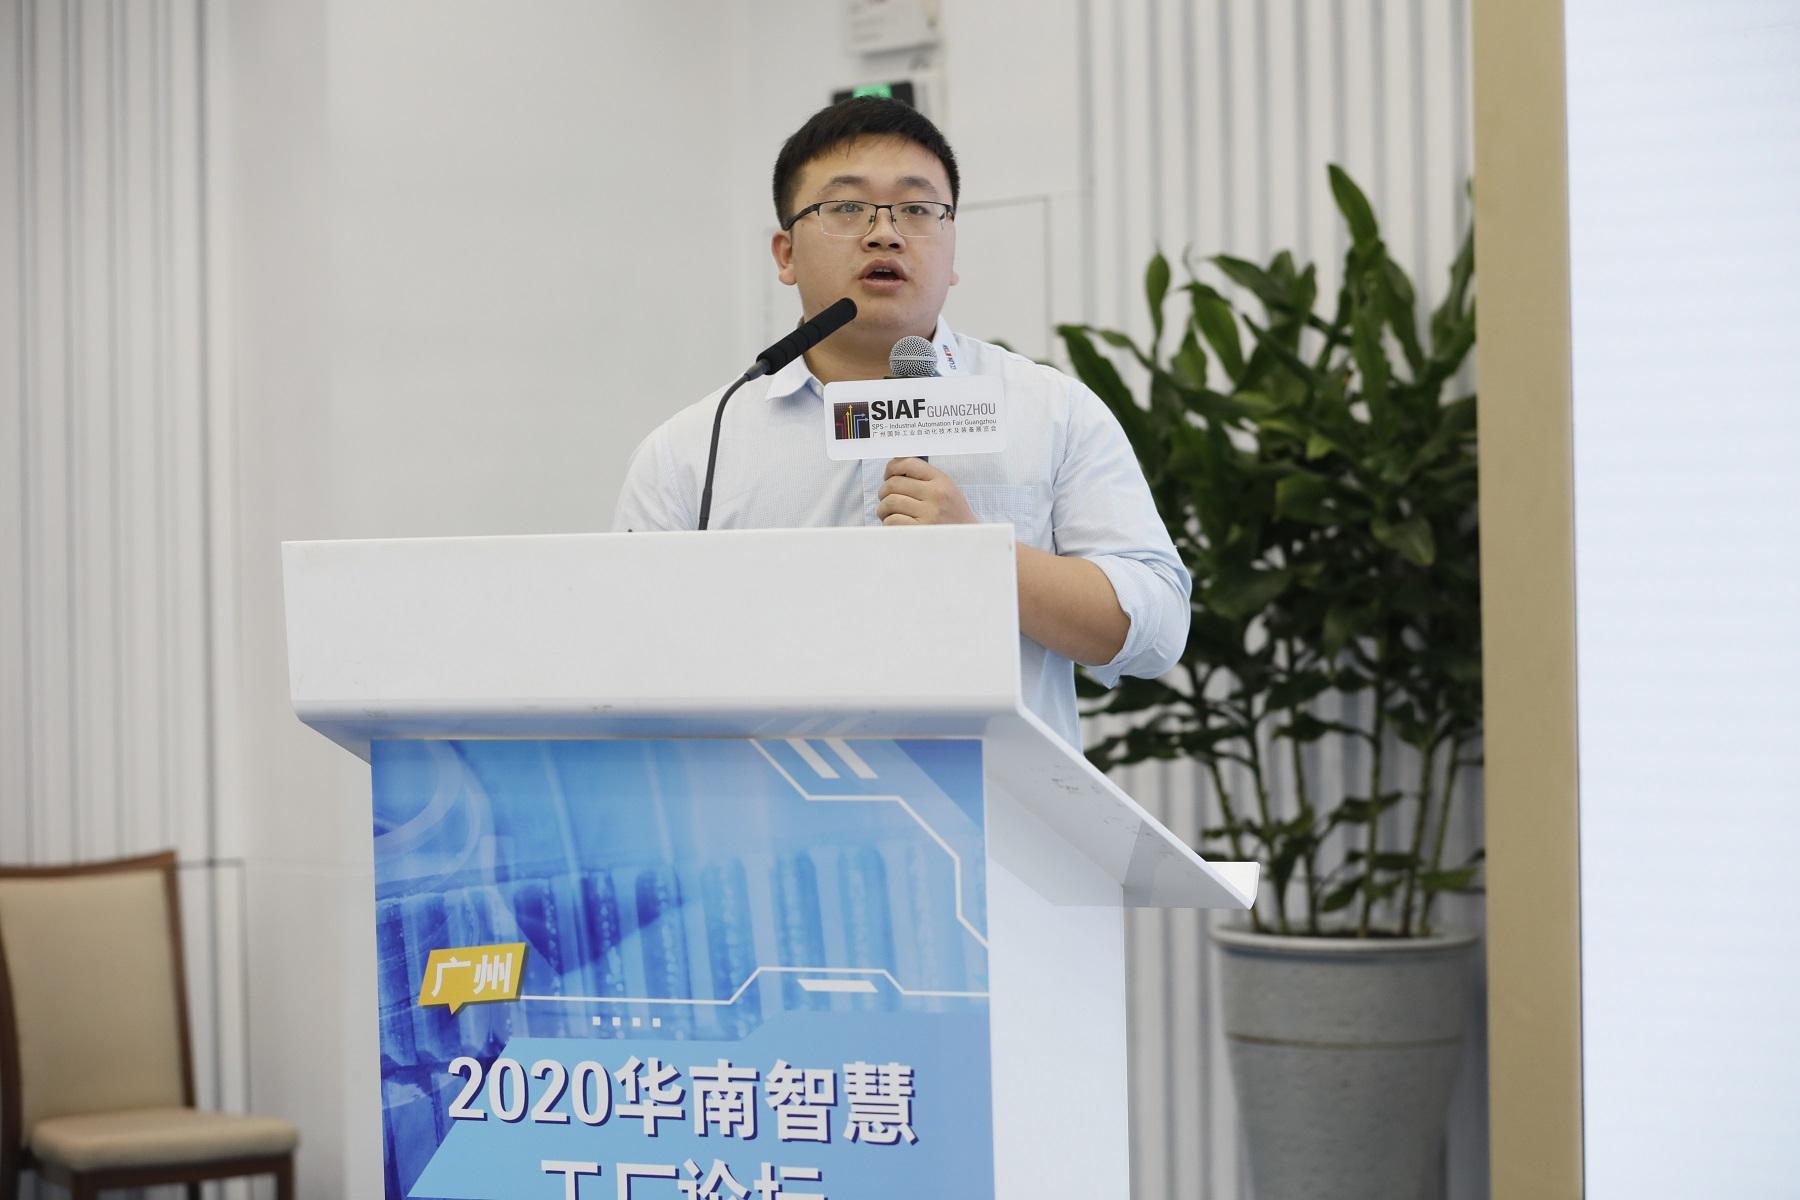 CC-Link 协会应用工程师邱晓东